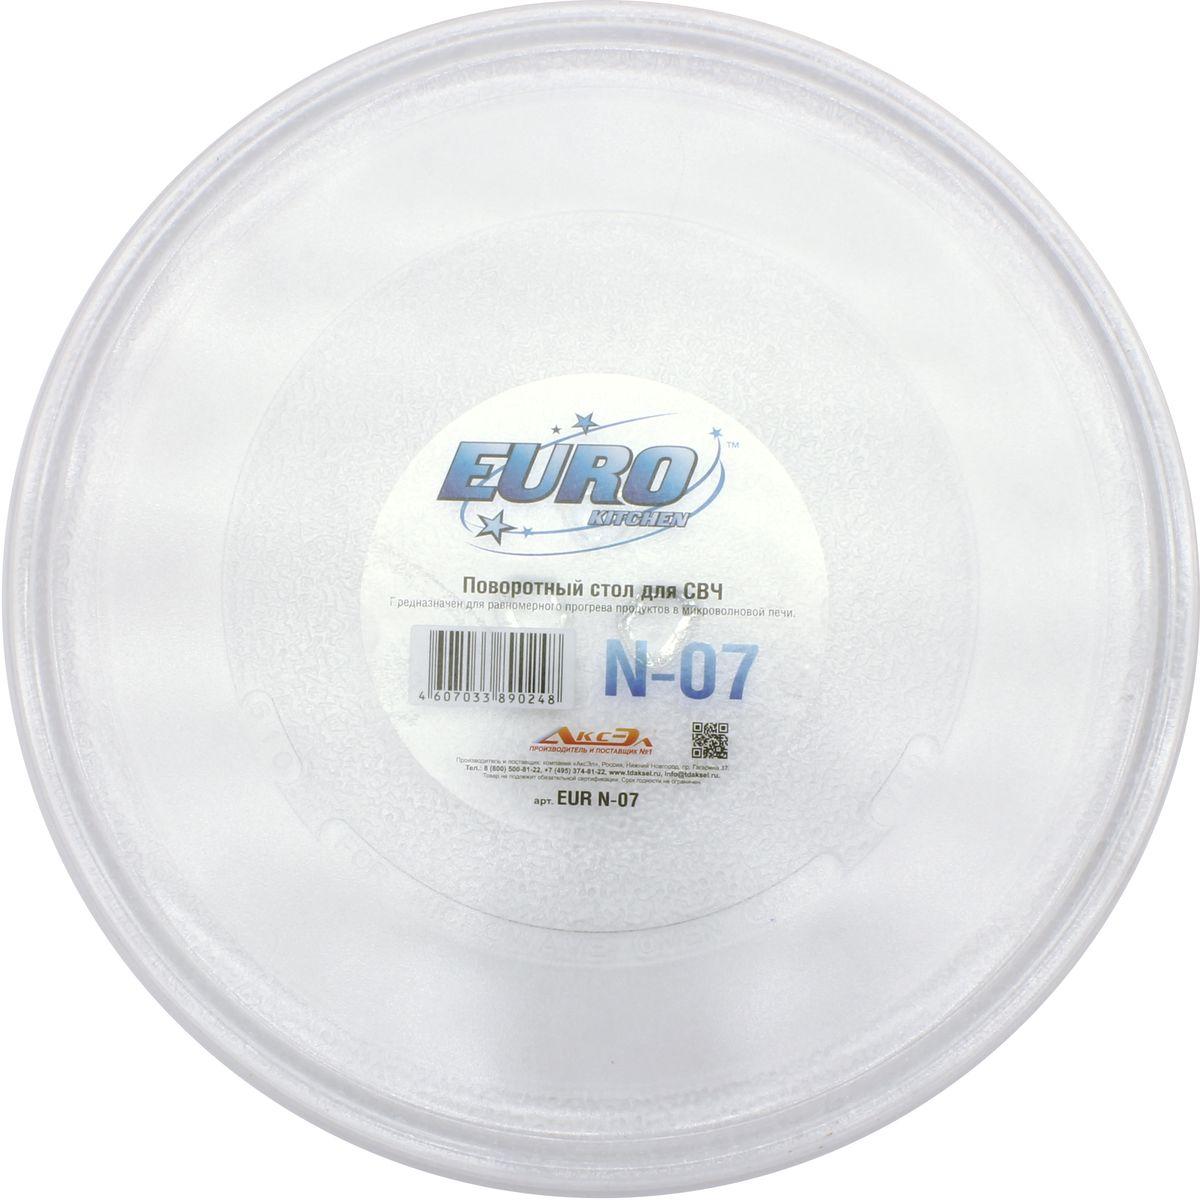 Euro Kitchen N-07 тарелка для СВЧN-07Универсальная тарелка N-07 для микроволновой печи с куплером. Диаметр тарелки 265 мм. Изготовлена из специального жаропрочного стекла. Предназначена для равномерного разогрева продуктов в микроволновой печи. Подходит для брендов: Aeg, Airhot, Amica, Ardo, Ariston, Asko, Atlanta, Aurora, Ava, Barazza, Bauknecht, Bbk, Beko, Bomann, Bork, Bosch, Brandt, Candy, Cata, Centek, Clatronic, Daewoo, De dietrich, Delfa, Electrolux, Elenberg, Ergo, Erisson, Eurotec, Fagor, Fimar, Foster, Franke, Fulgor, Fusion, Gaggenau, Gastrorag, Goldstar, Gorenje, Hankel, Hansa, Hilton, Horizont, Hurakan, Hyundai, Ilve, Indesit, Kaiser, Kenmore, Kenwood, Korting, Kuppersberg, Kuppersbusch, Kamark, Keran, Lg, Liberton, Liberty, Maxwell, Menumaster, Midea, Miele, Moulinex, Mystery, Neff, Oursson, Panasonic, Proficook, Rainford, Redmond, Rolsen, Samsung, Saturn, Scarlett, Sencor, Sharp, Siemens, Simfer, Sinbo, Sirman, Smeg, Supra, Teka, Thomson, Toshiba, V-zug, Vasko, Vimar, Vitek, Vr, Weissgauff,...